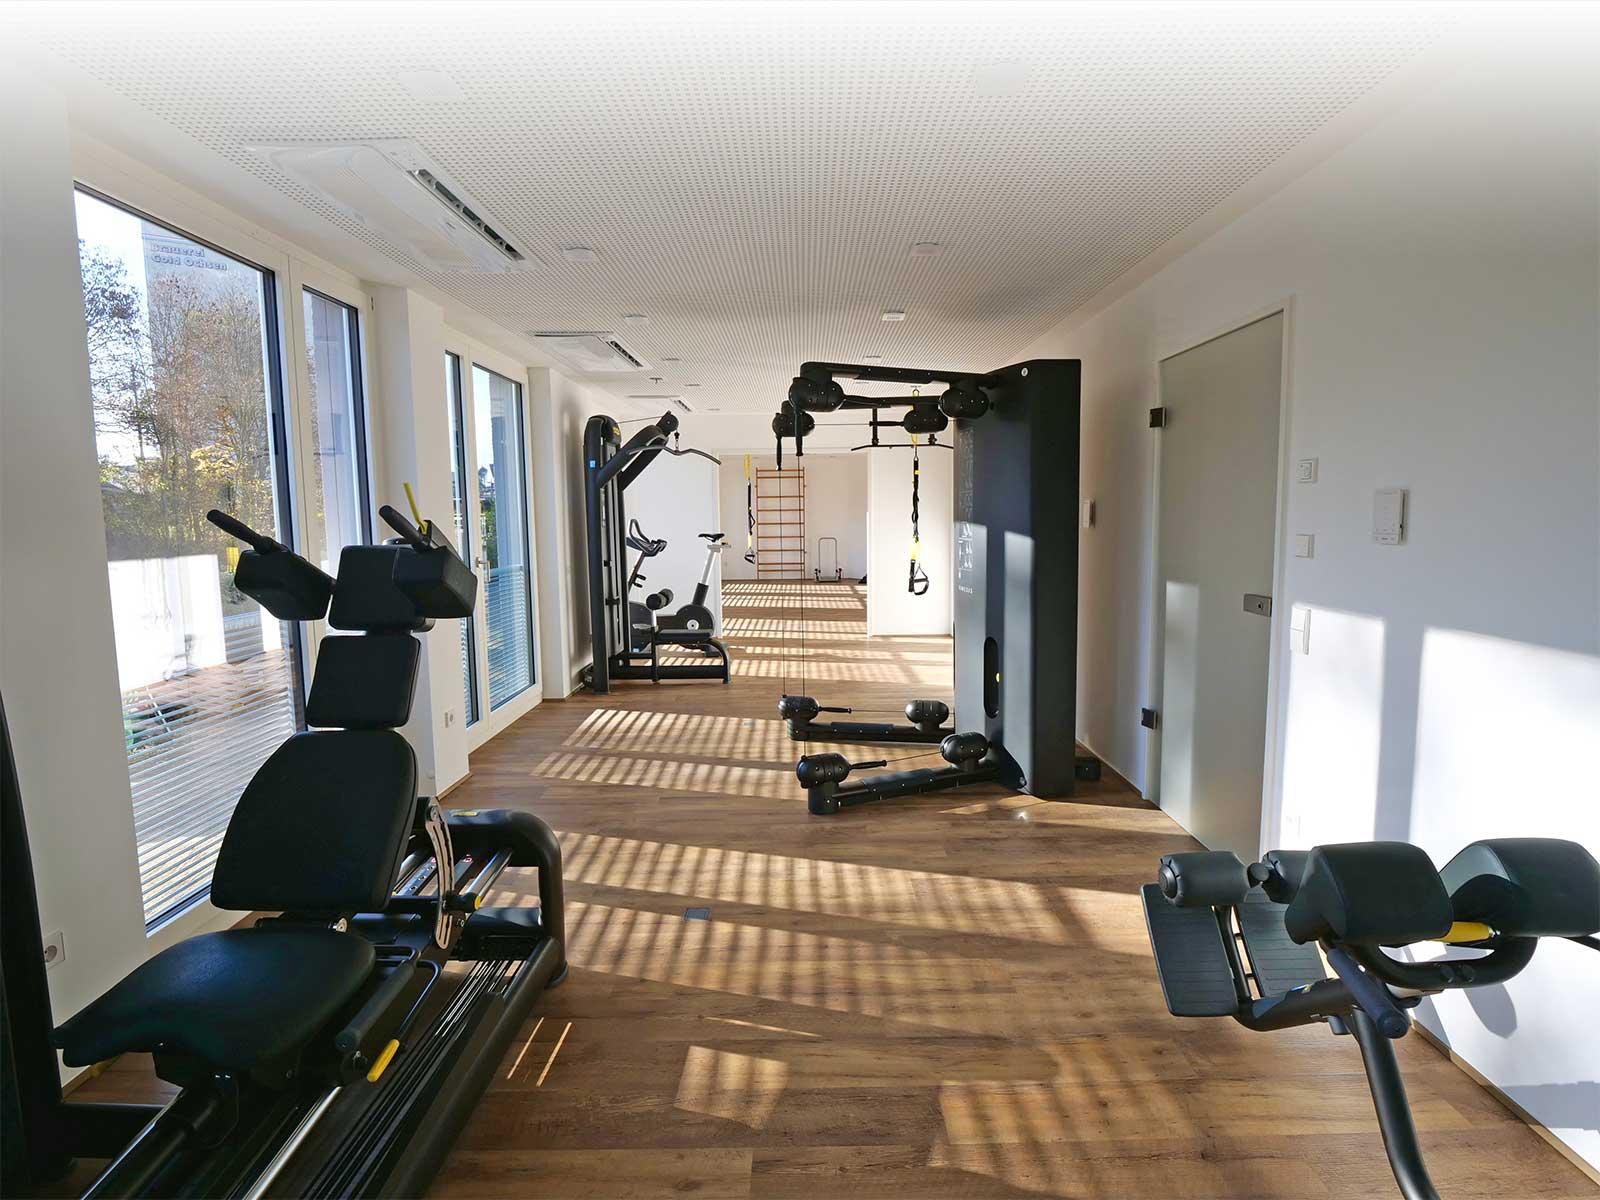 M1 Physiotherapie Osteopathie Sport Johannes Lang David Palmbach Marchtalerstr 1 89075 Ulm